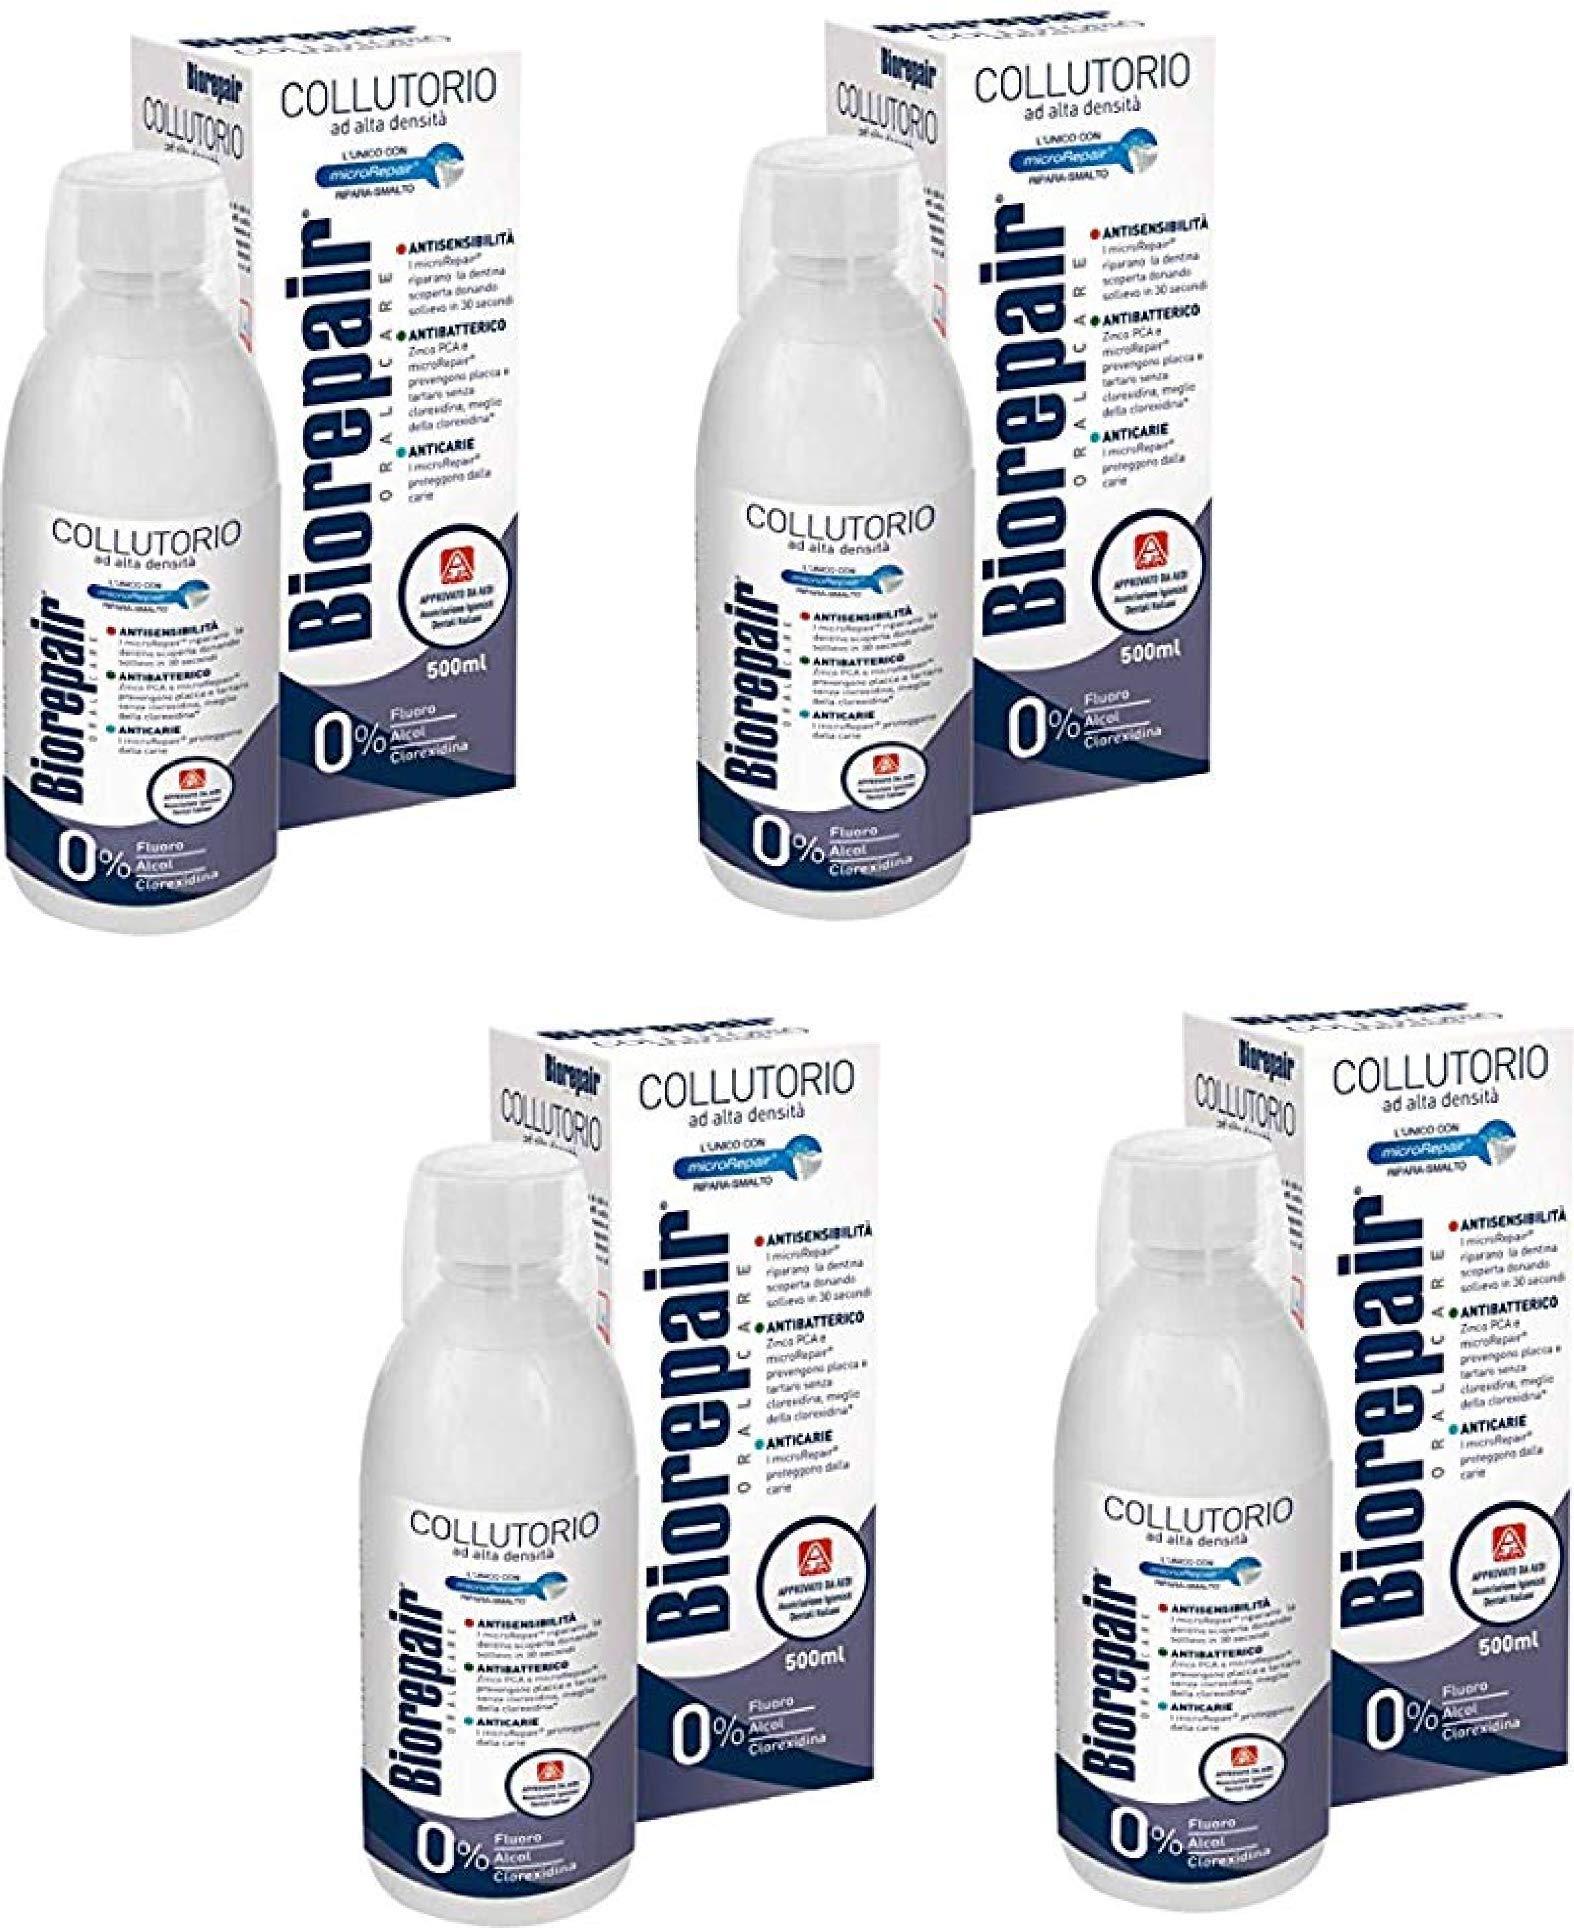 Biorepair:'' Collutorio'' Mouthwash with Antibacterical - 500ml/16.9 fl.oz - Pack of 4